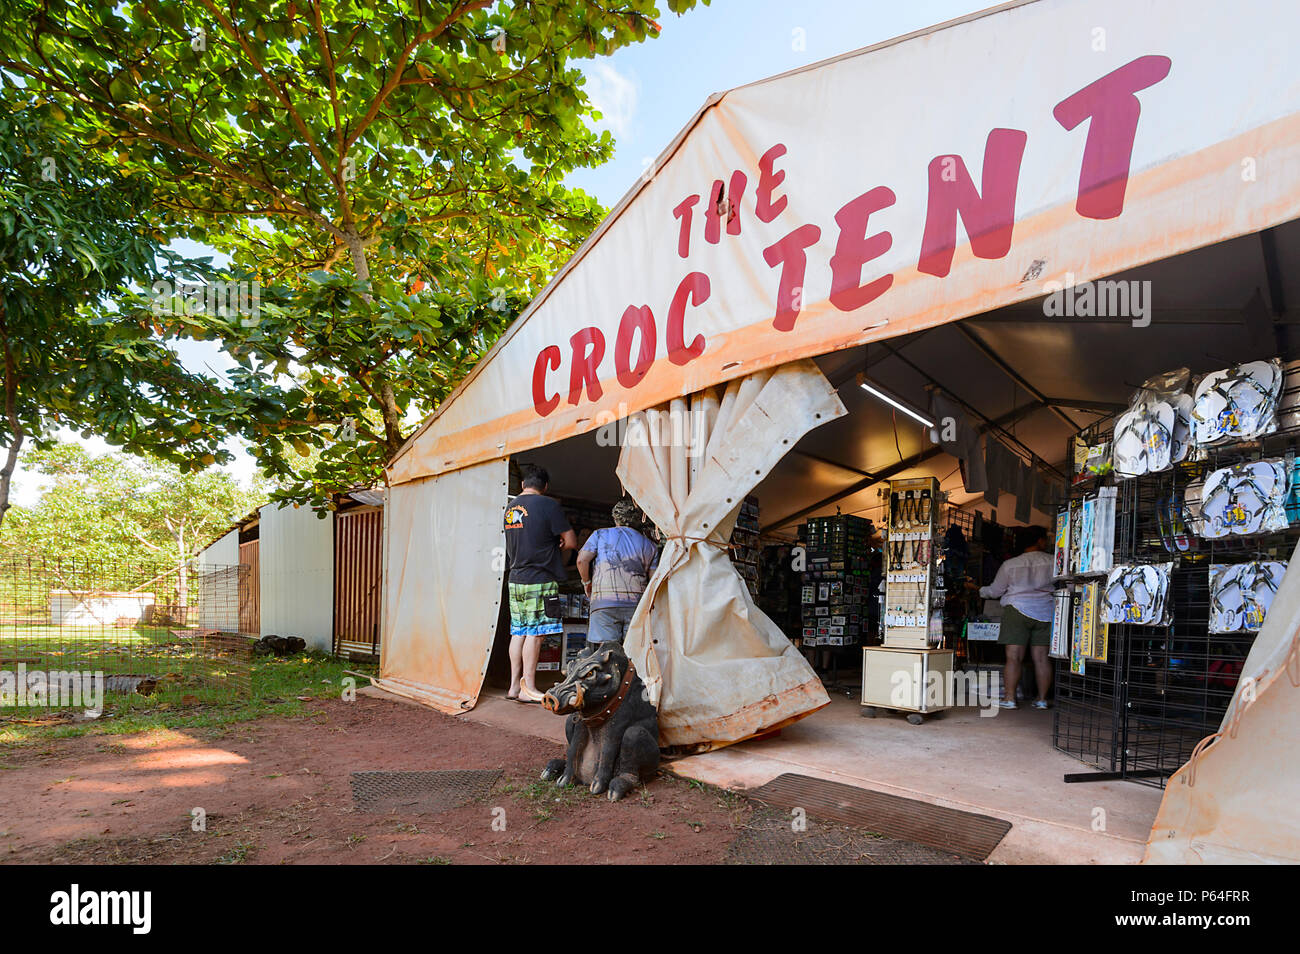 The Croc Tent, a souvenir shop and tourist attraction on Cape York Peninsula, Far North Queensland, FNQ, QLD, Australia - Stock Image